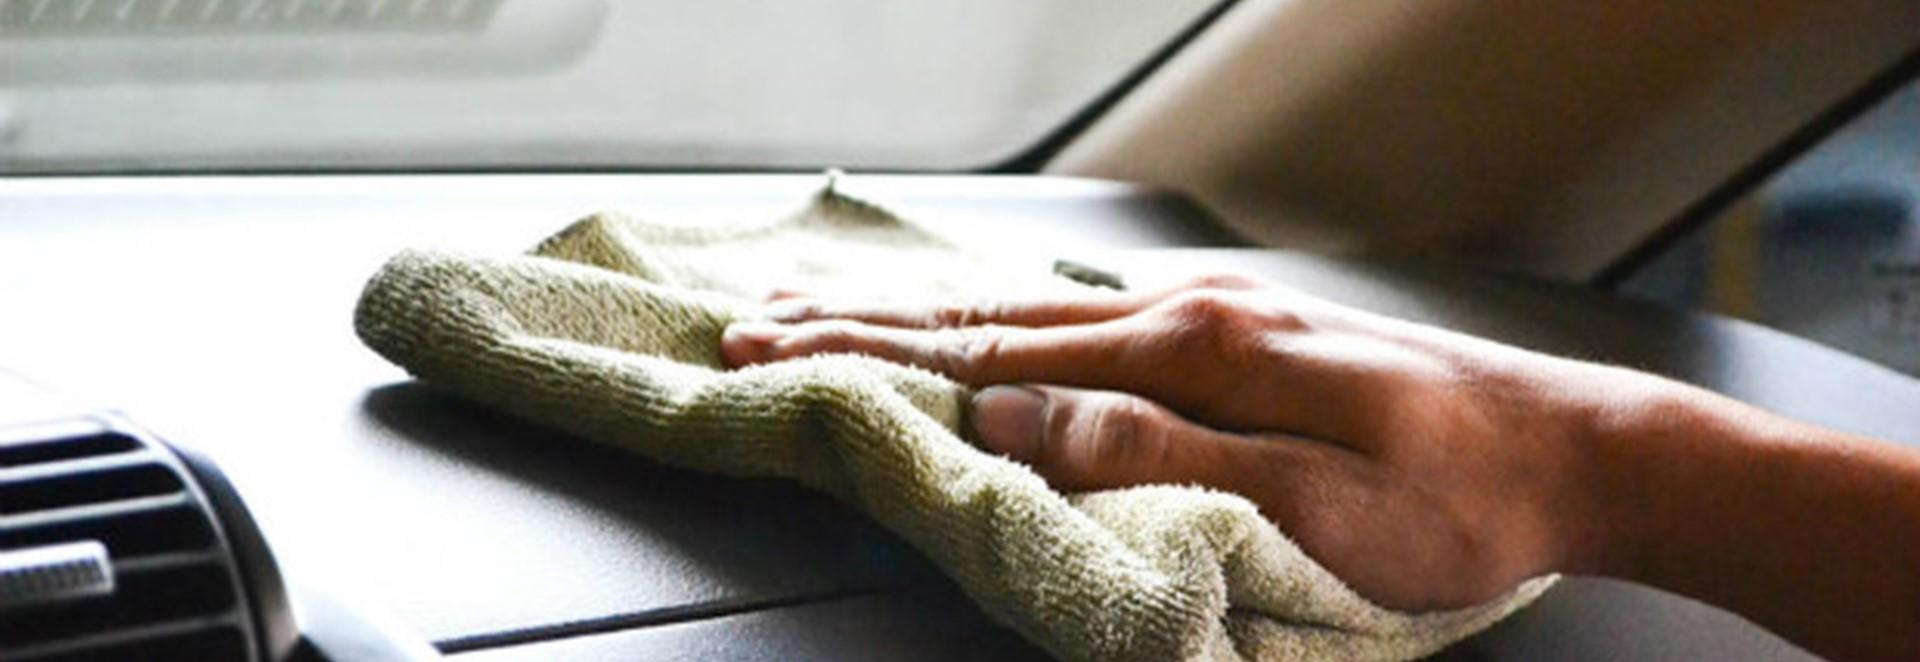 tips for cleaning your car s interior car keys. Black Bedroom Furniture Sets. Home Design Ideas